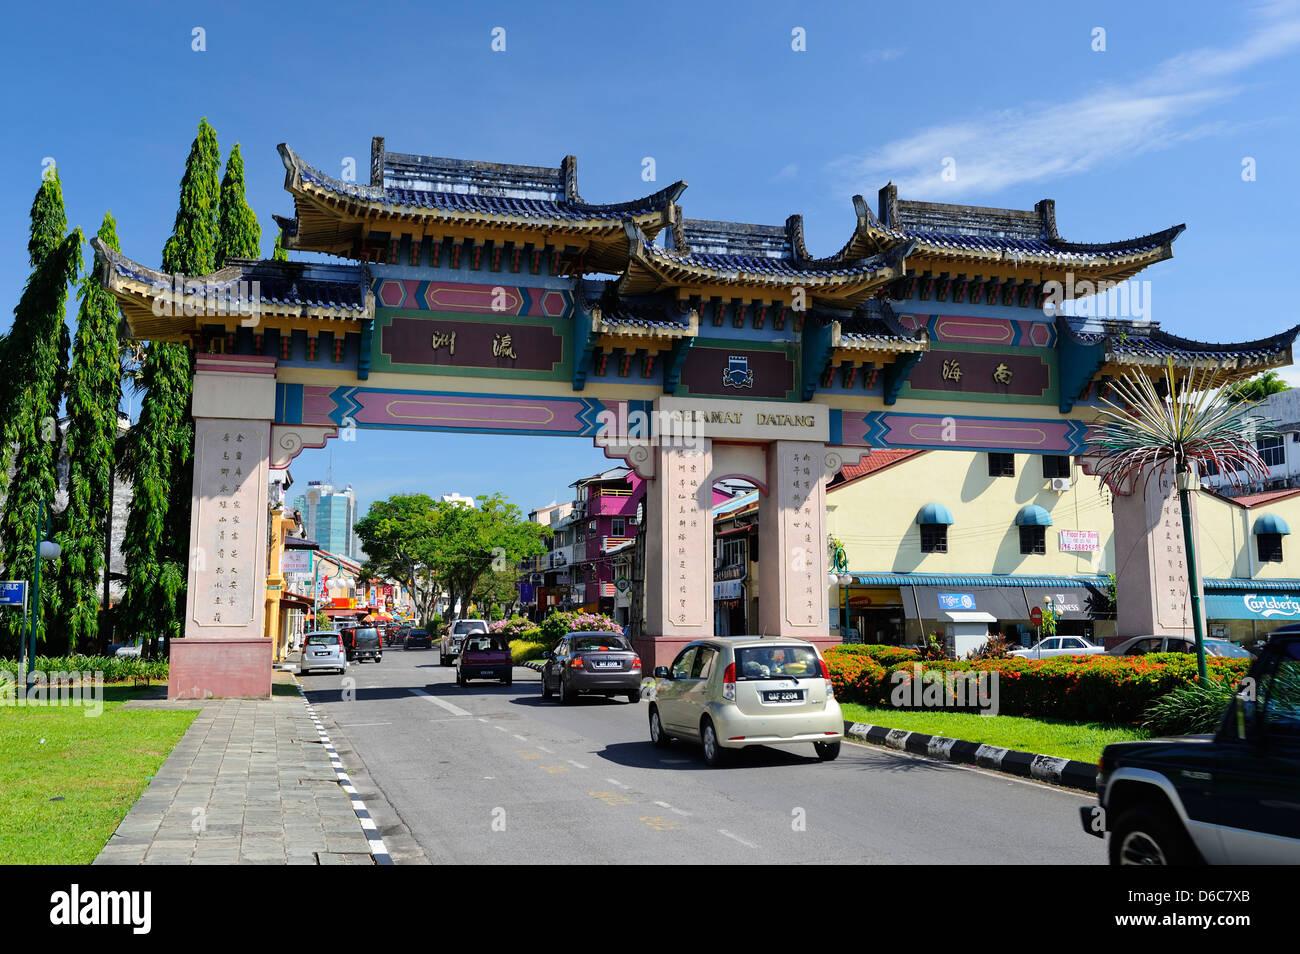 Chinese arch at entrance to Kuching, Sarawak, Borneo - Stock Image